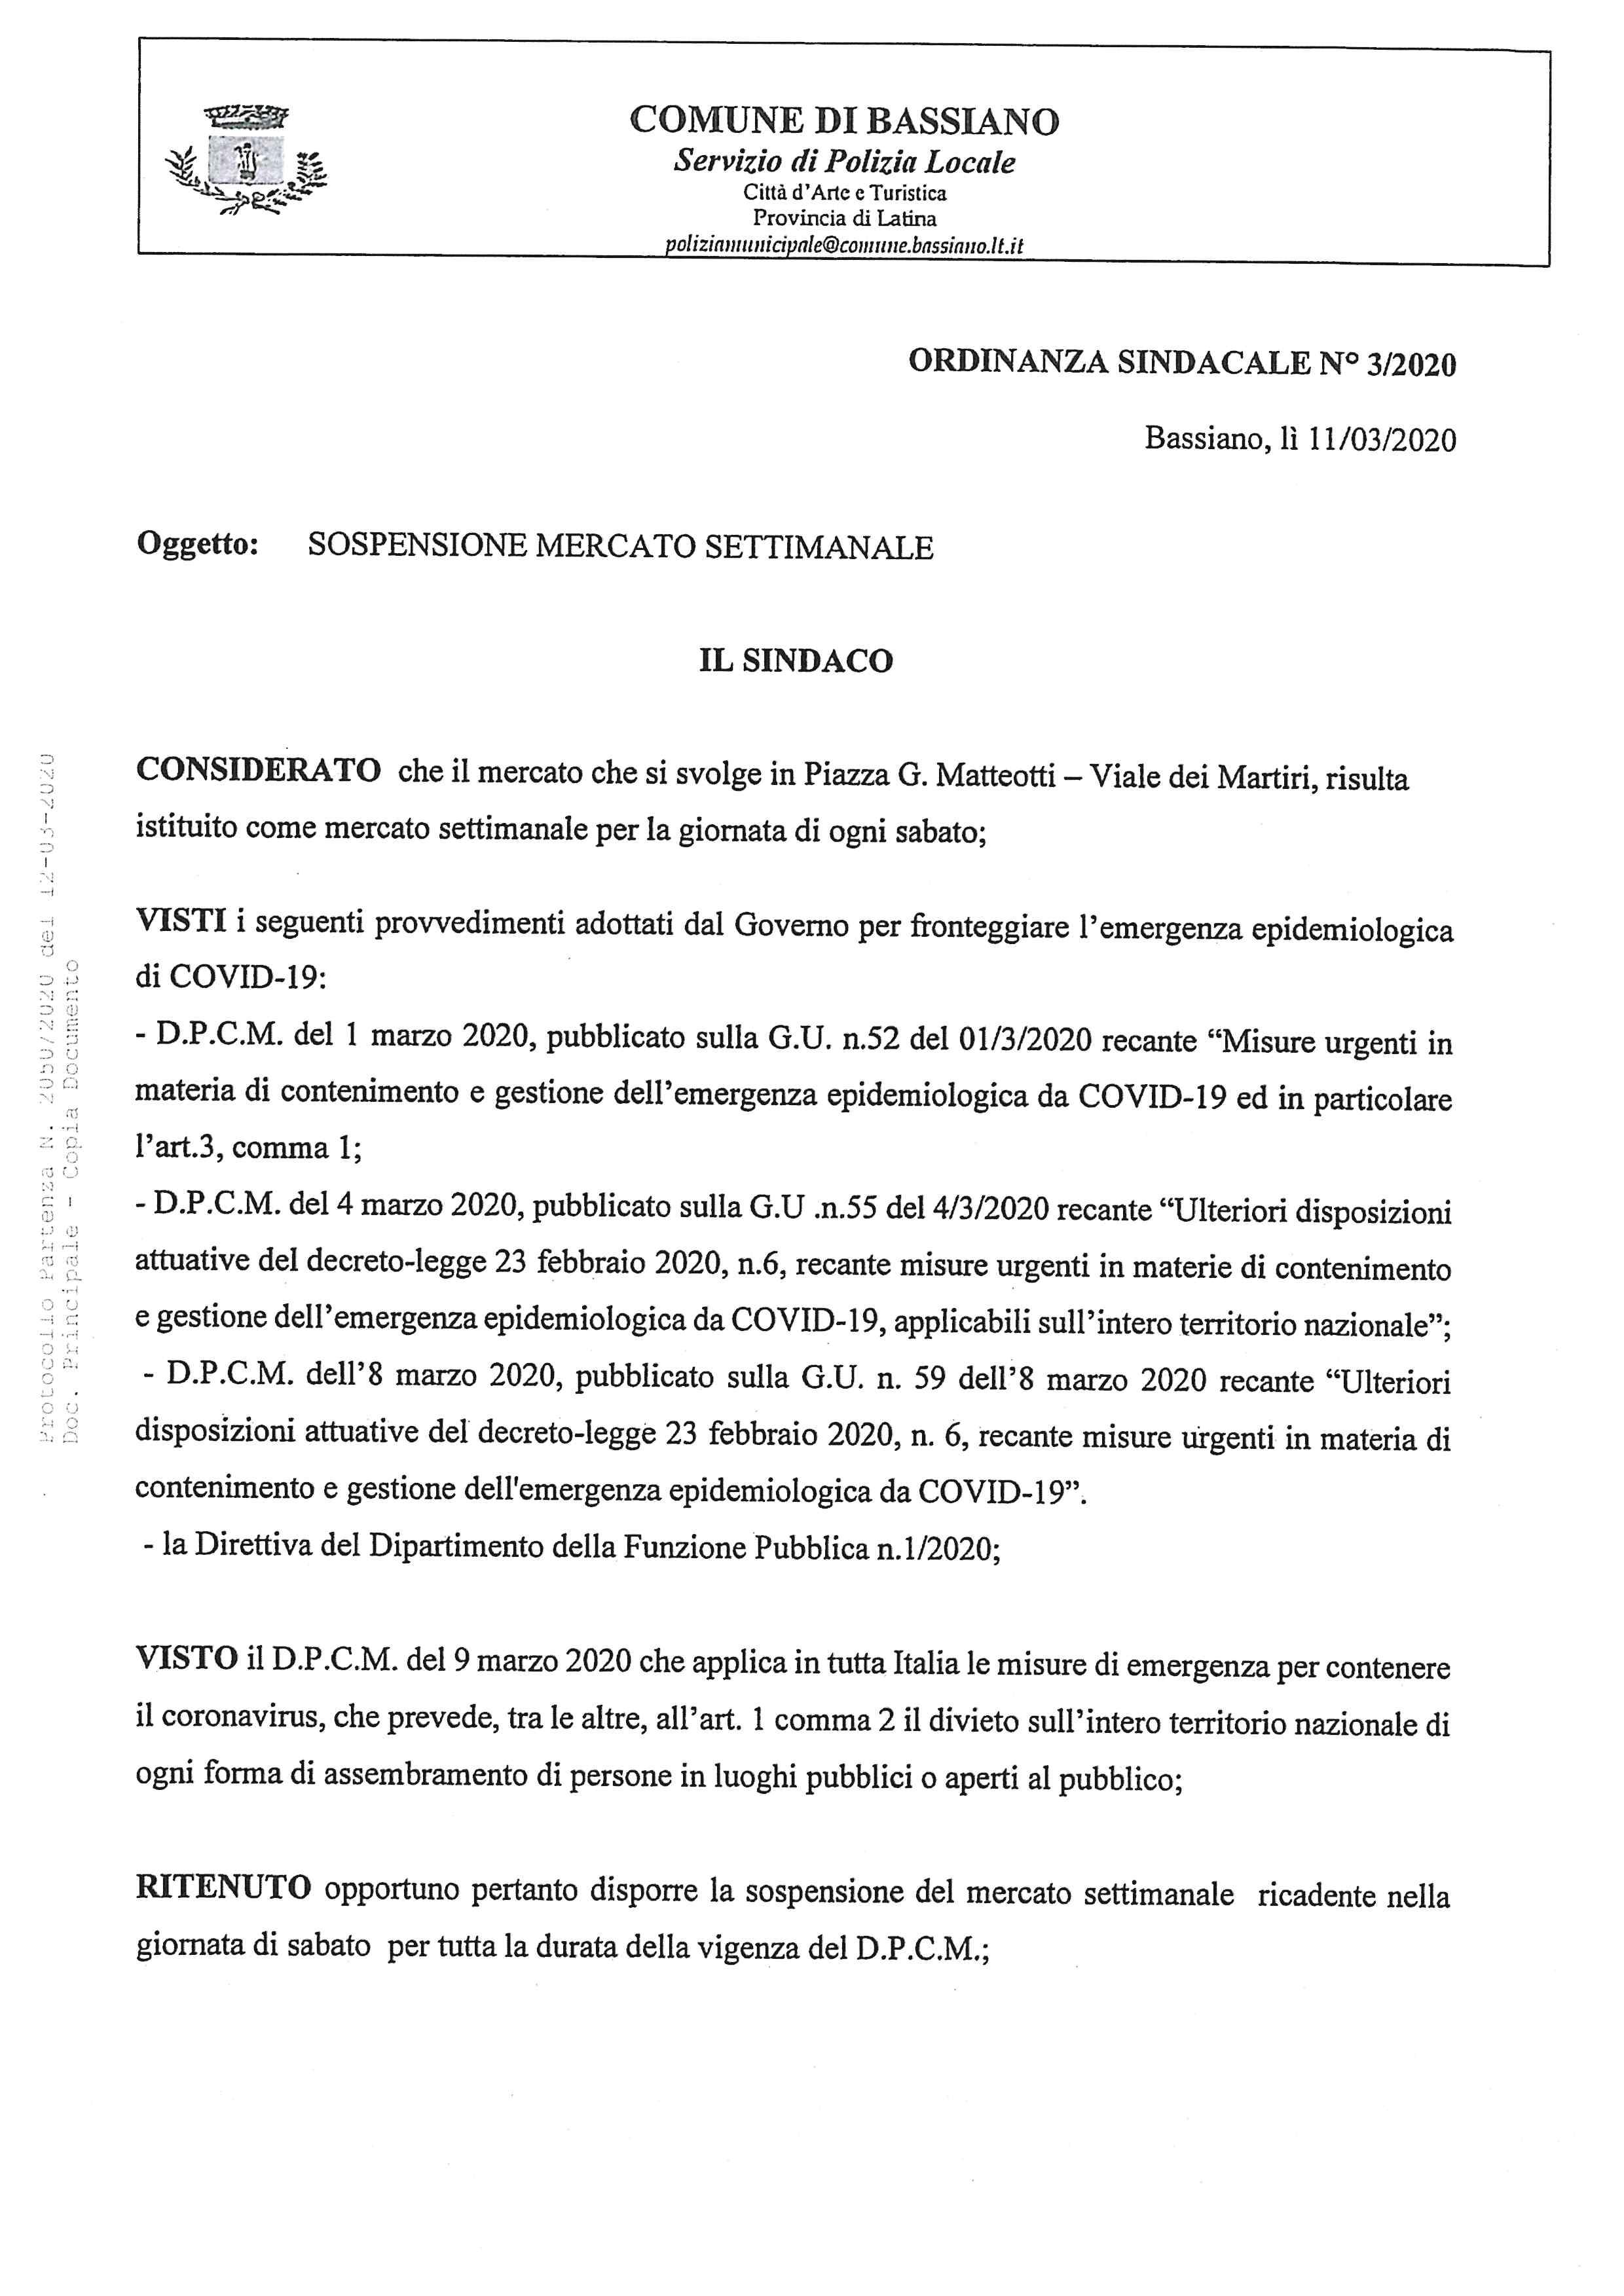 ORDINANZA SINDACALE N. 3/2020